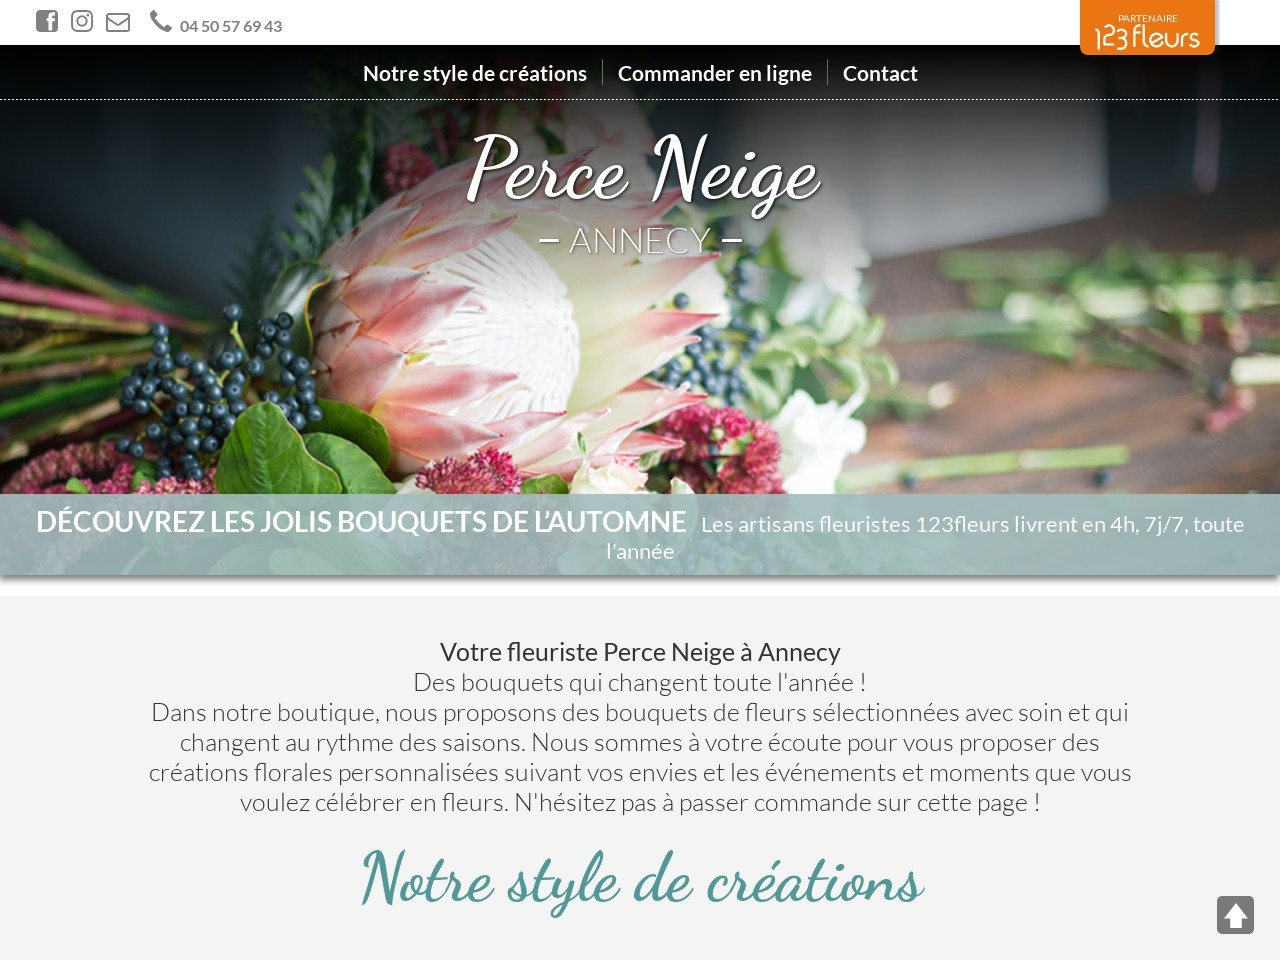 Site fleuriste Perce Neige - 123fleurs